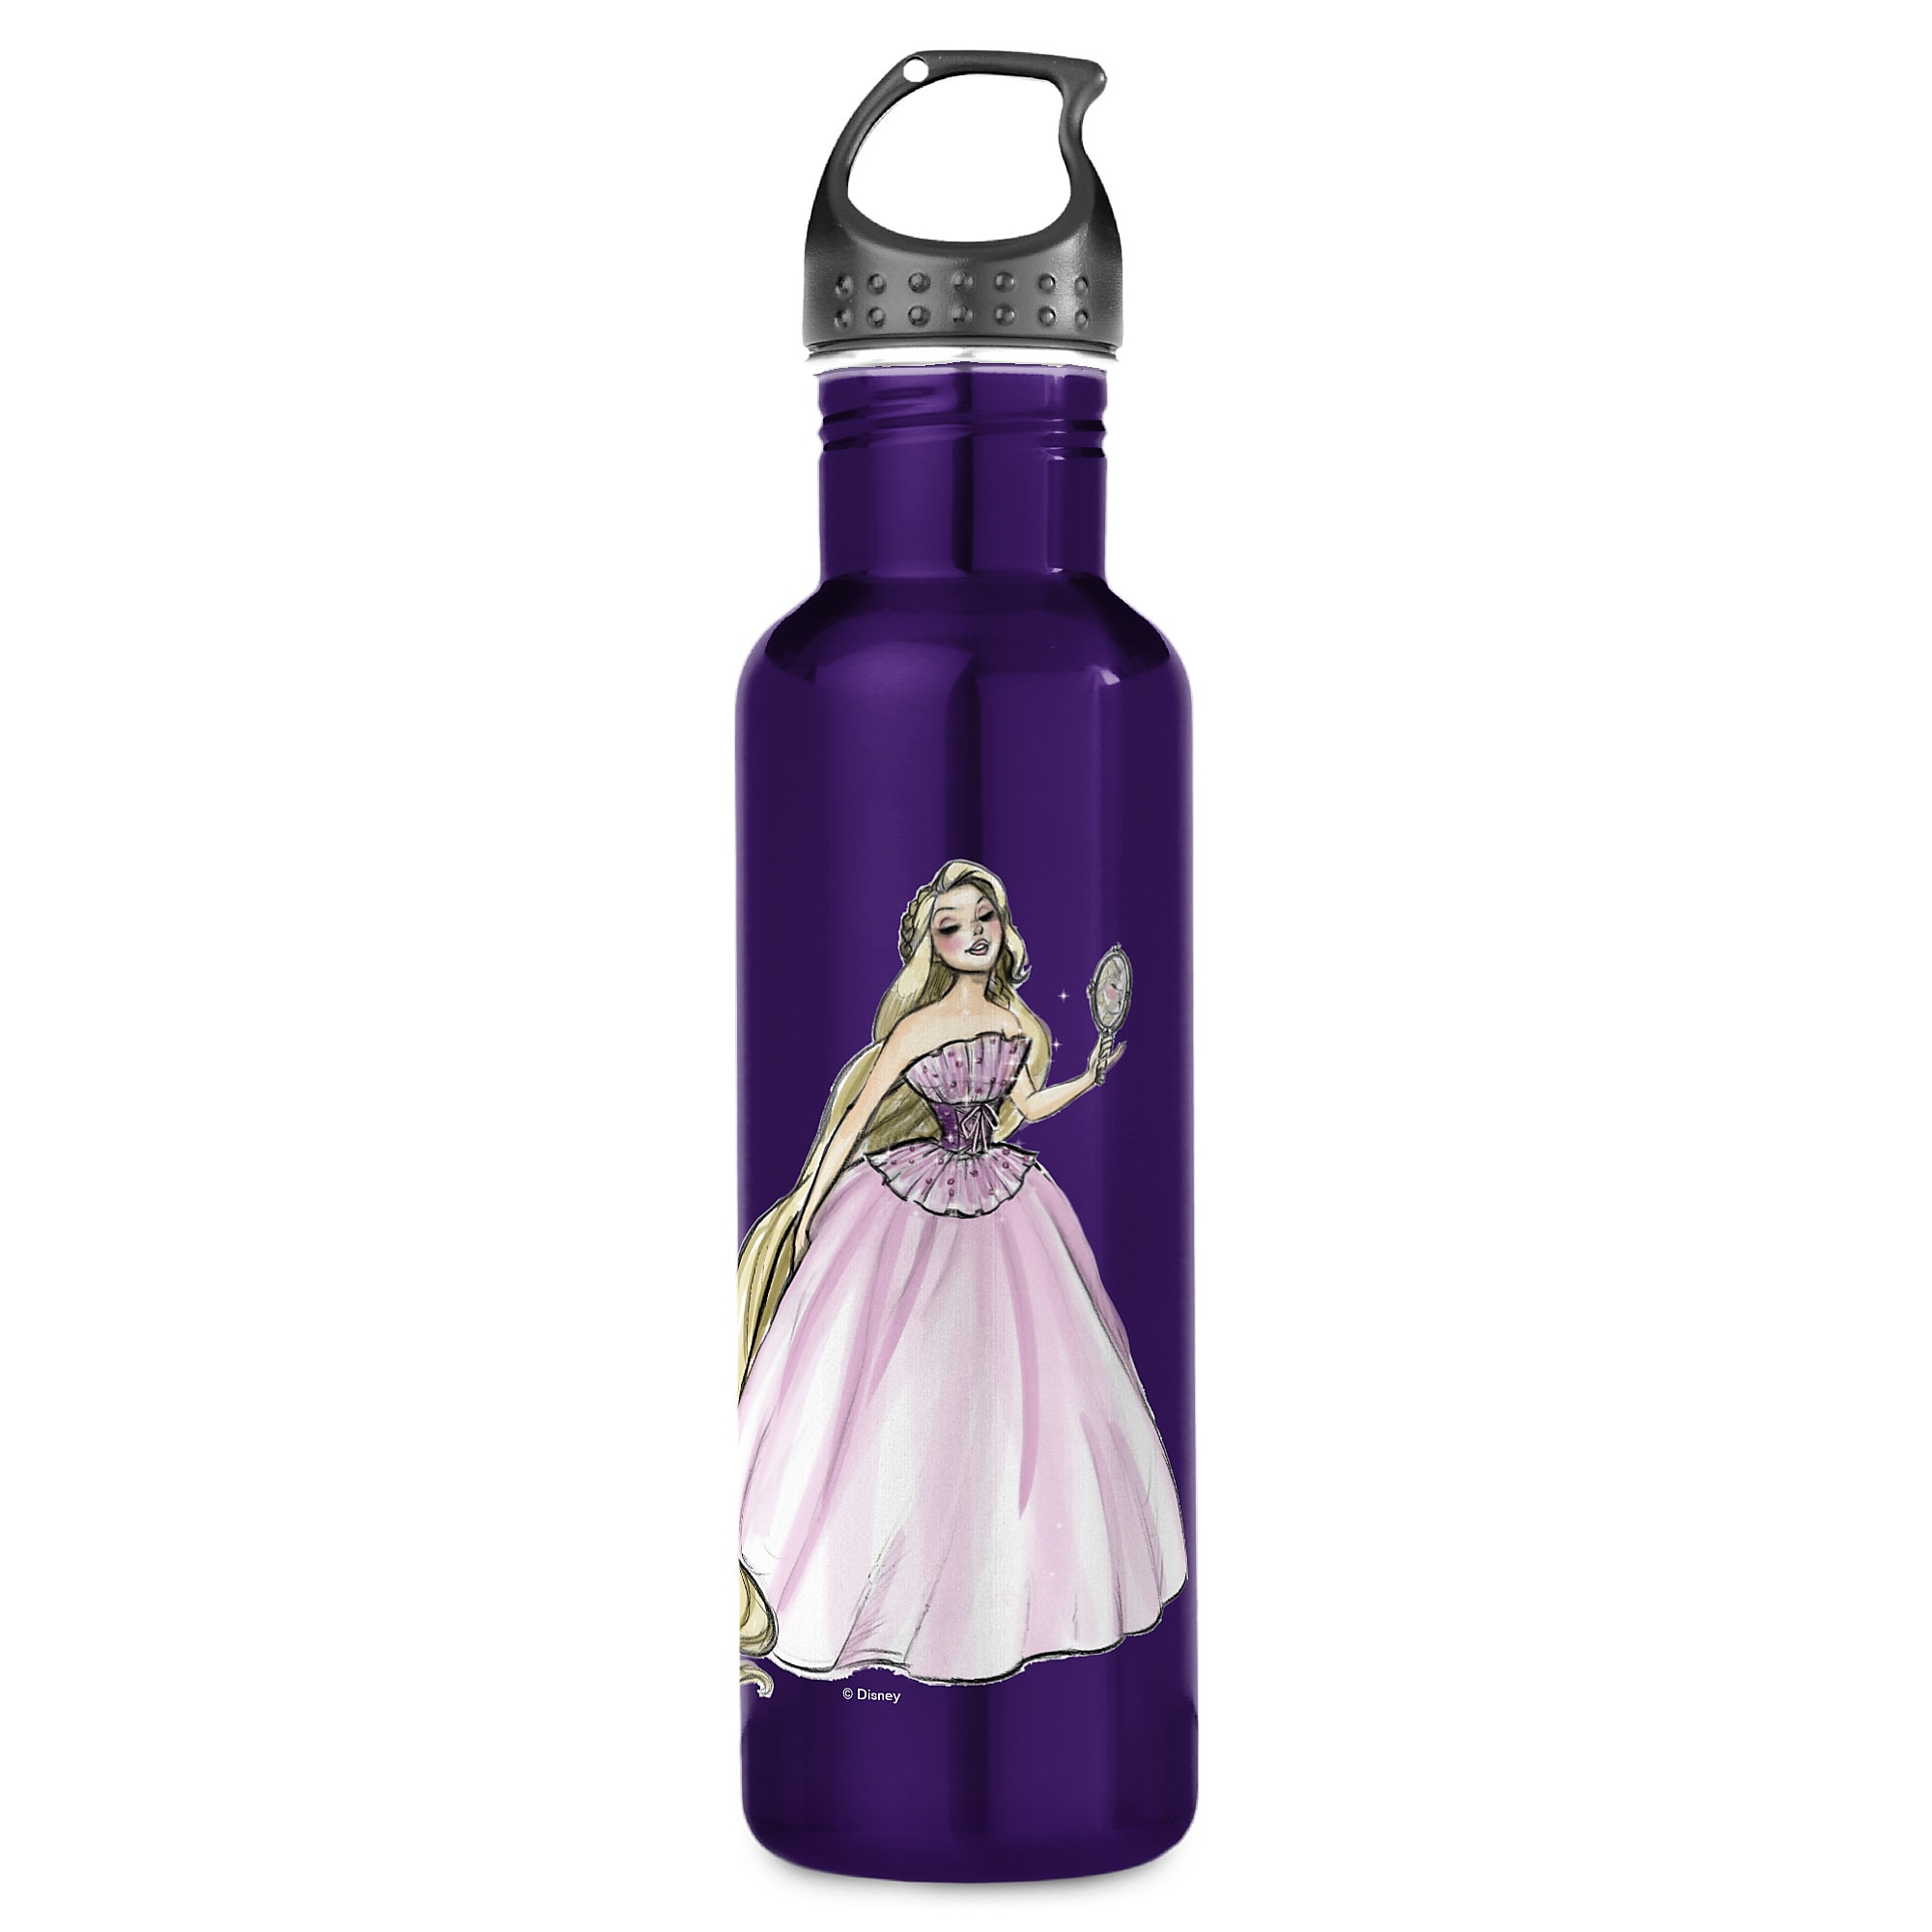 Rapunzel Water Bottle - Art of Princess Designer Collection